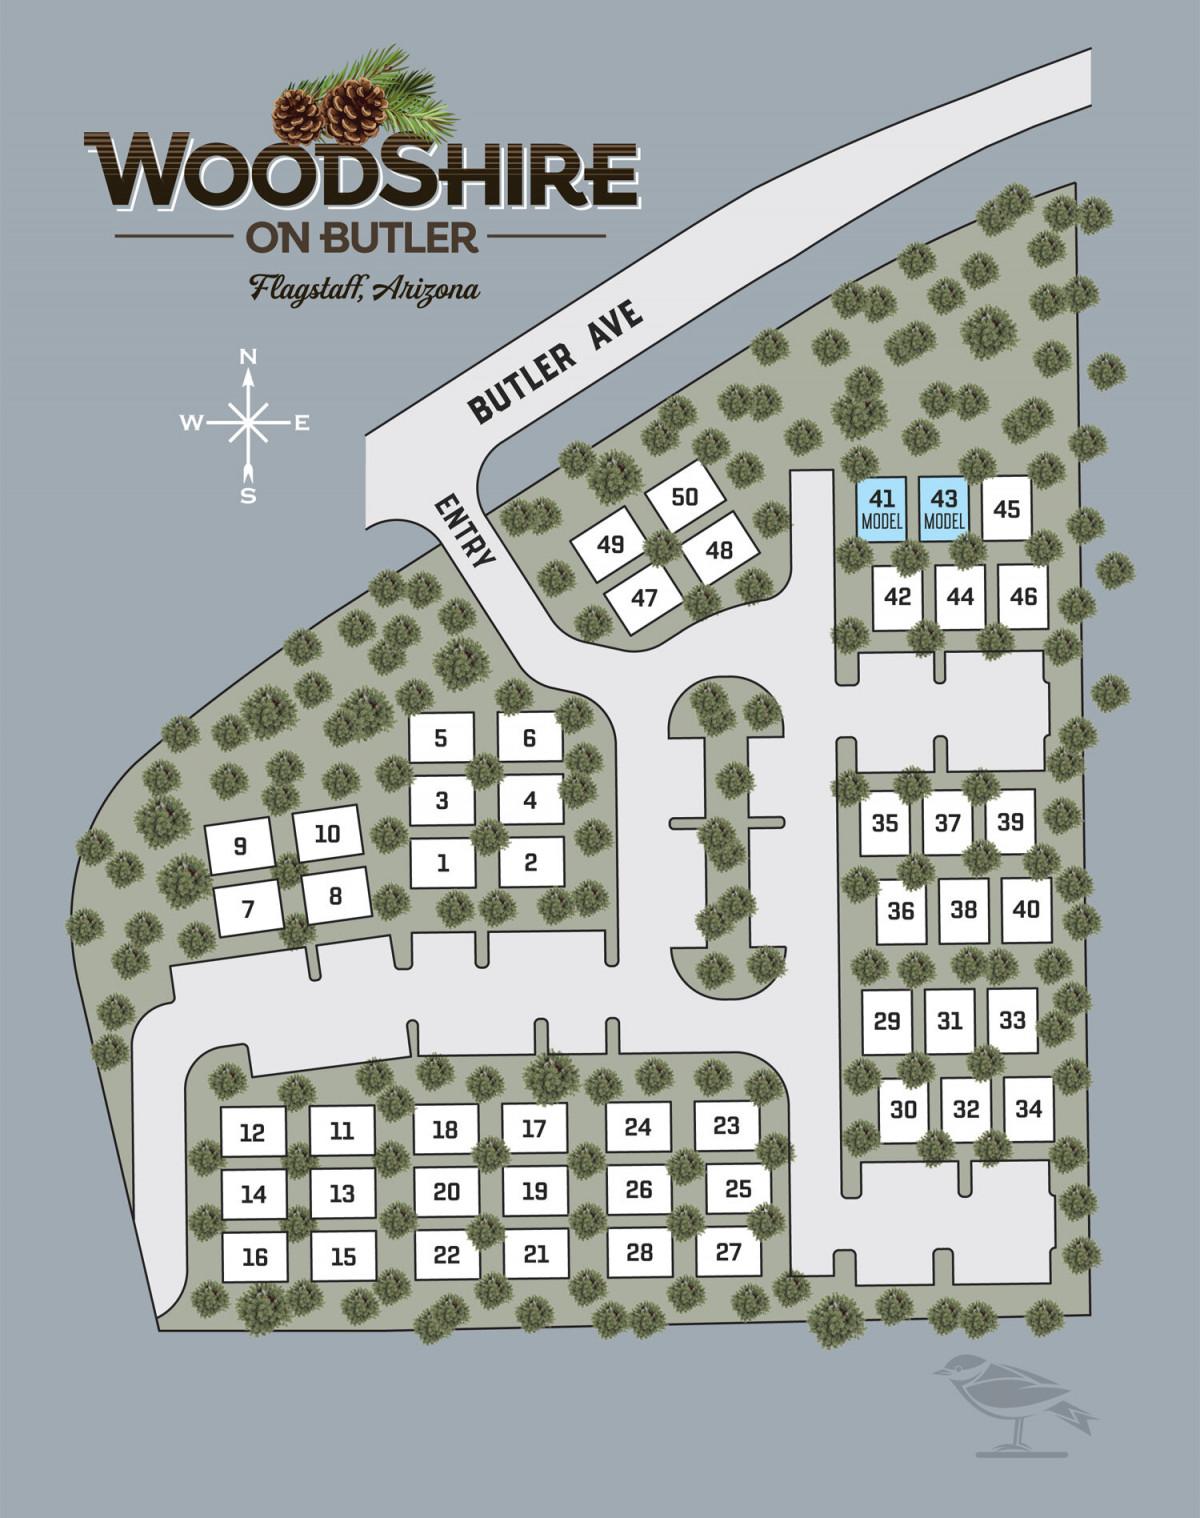 wooodshire